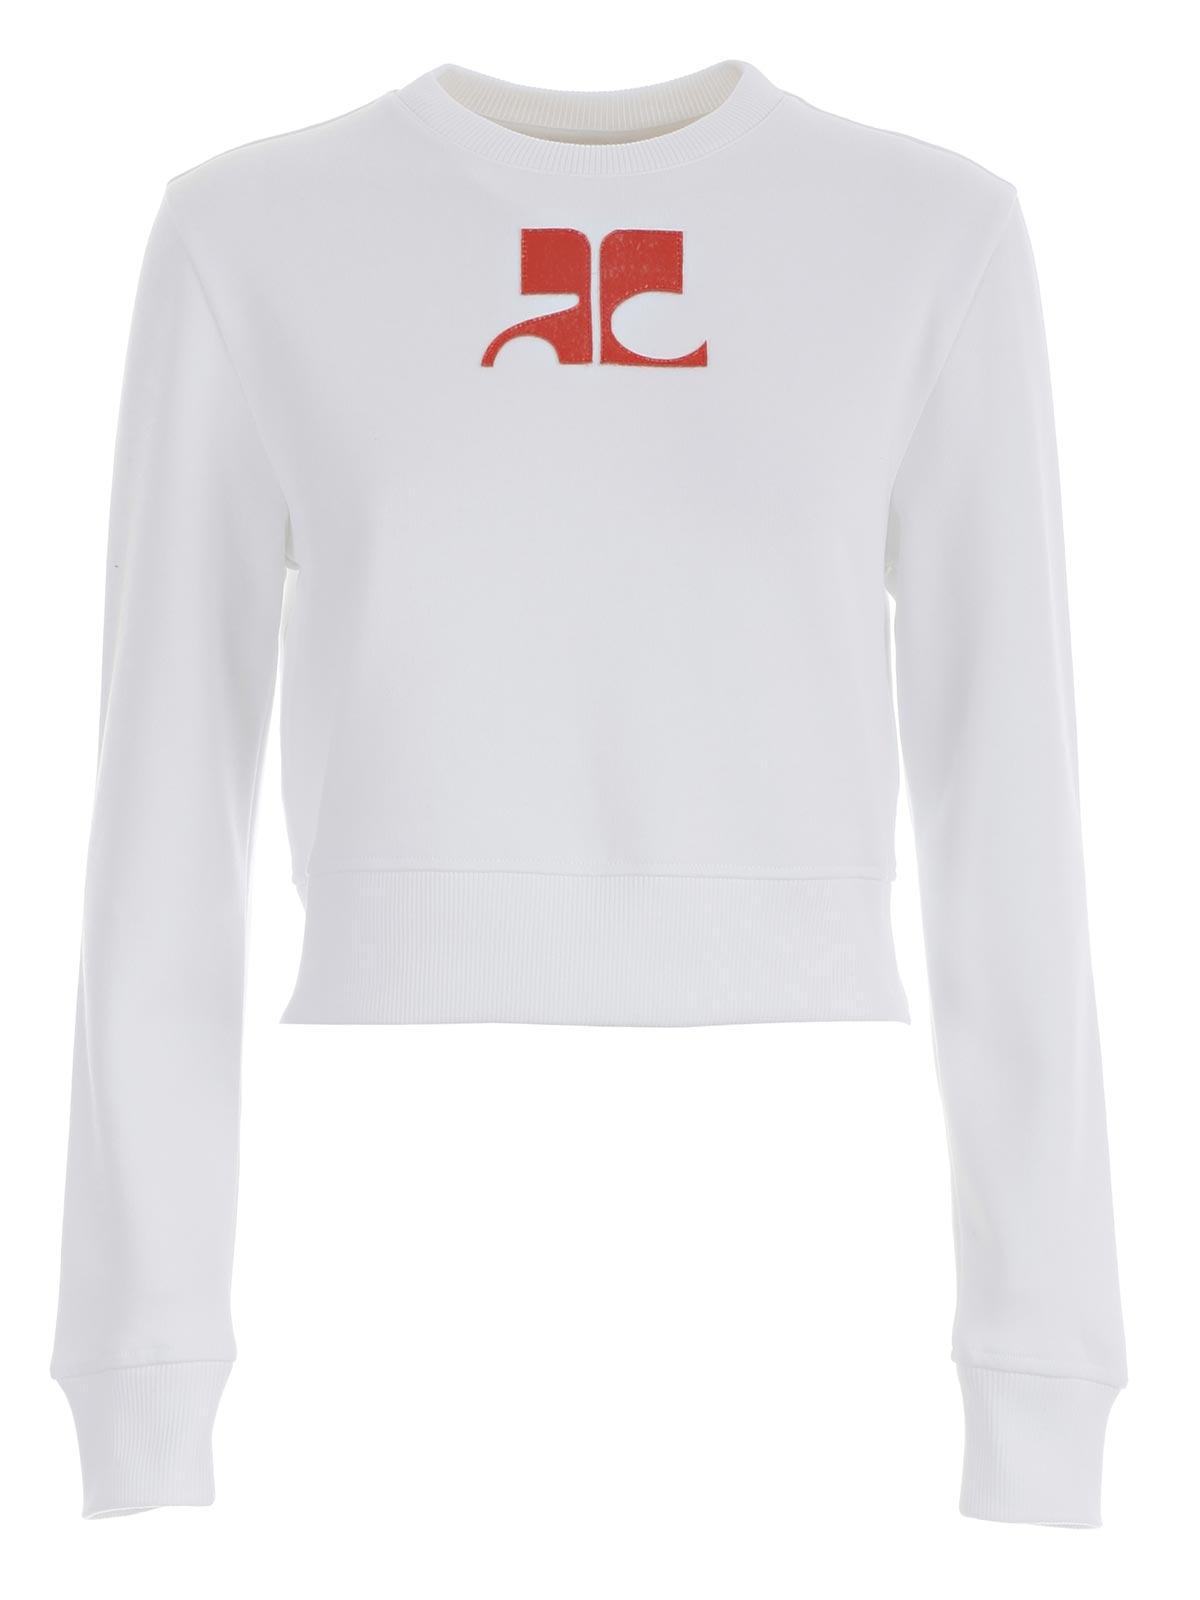 Picture of COURREGES SweatShirt